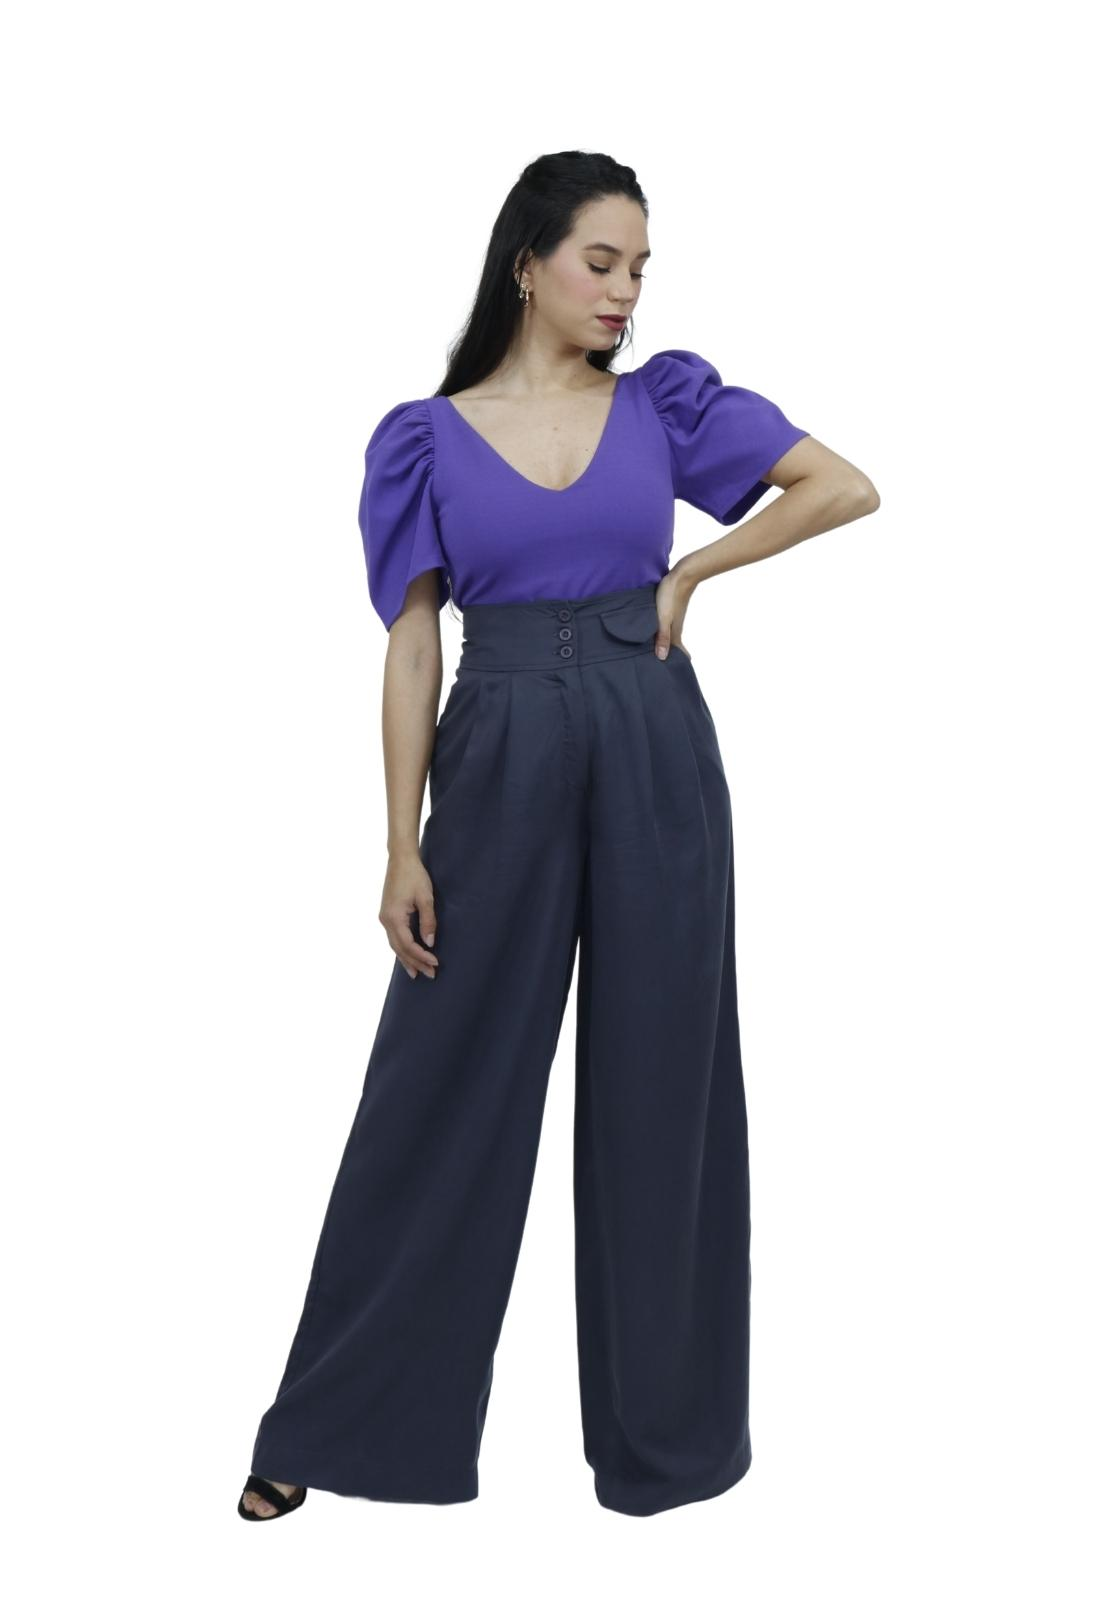 Calça Feminina Pantalona Cintura Alta Botões Elegante